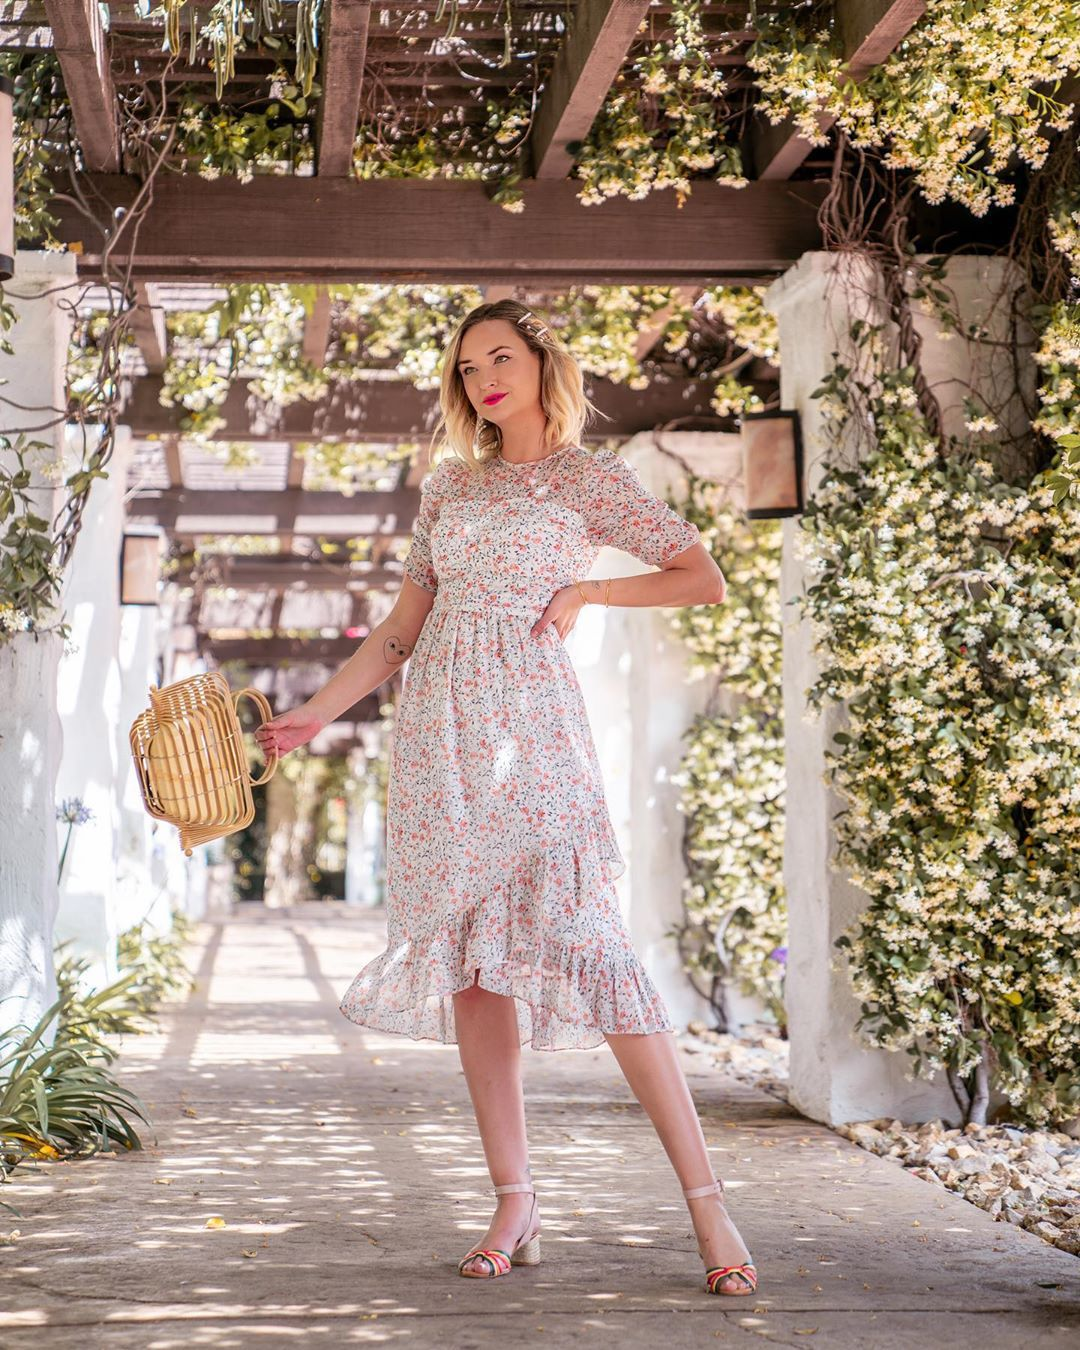 bag handbag midi dress floral dress short sleeve dress sandal heels